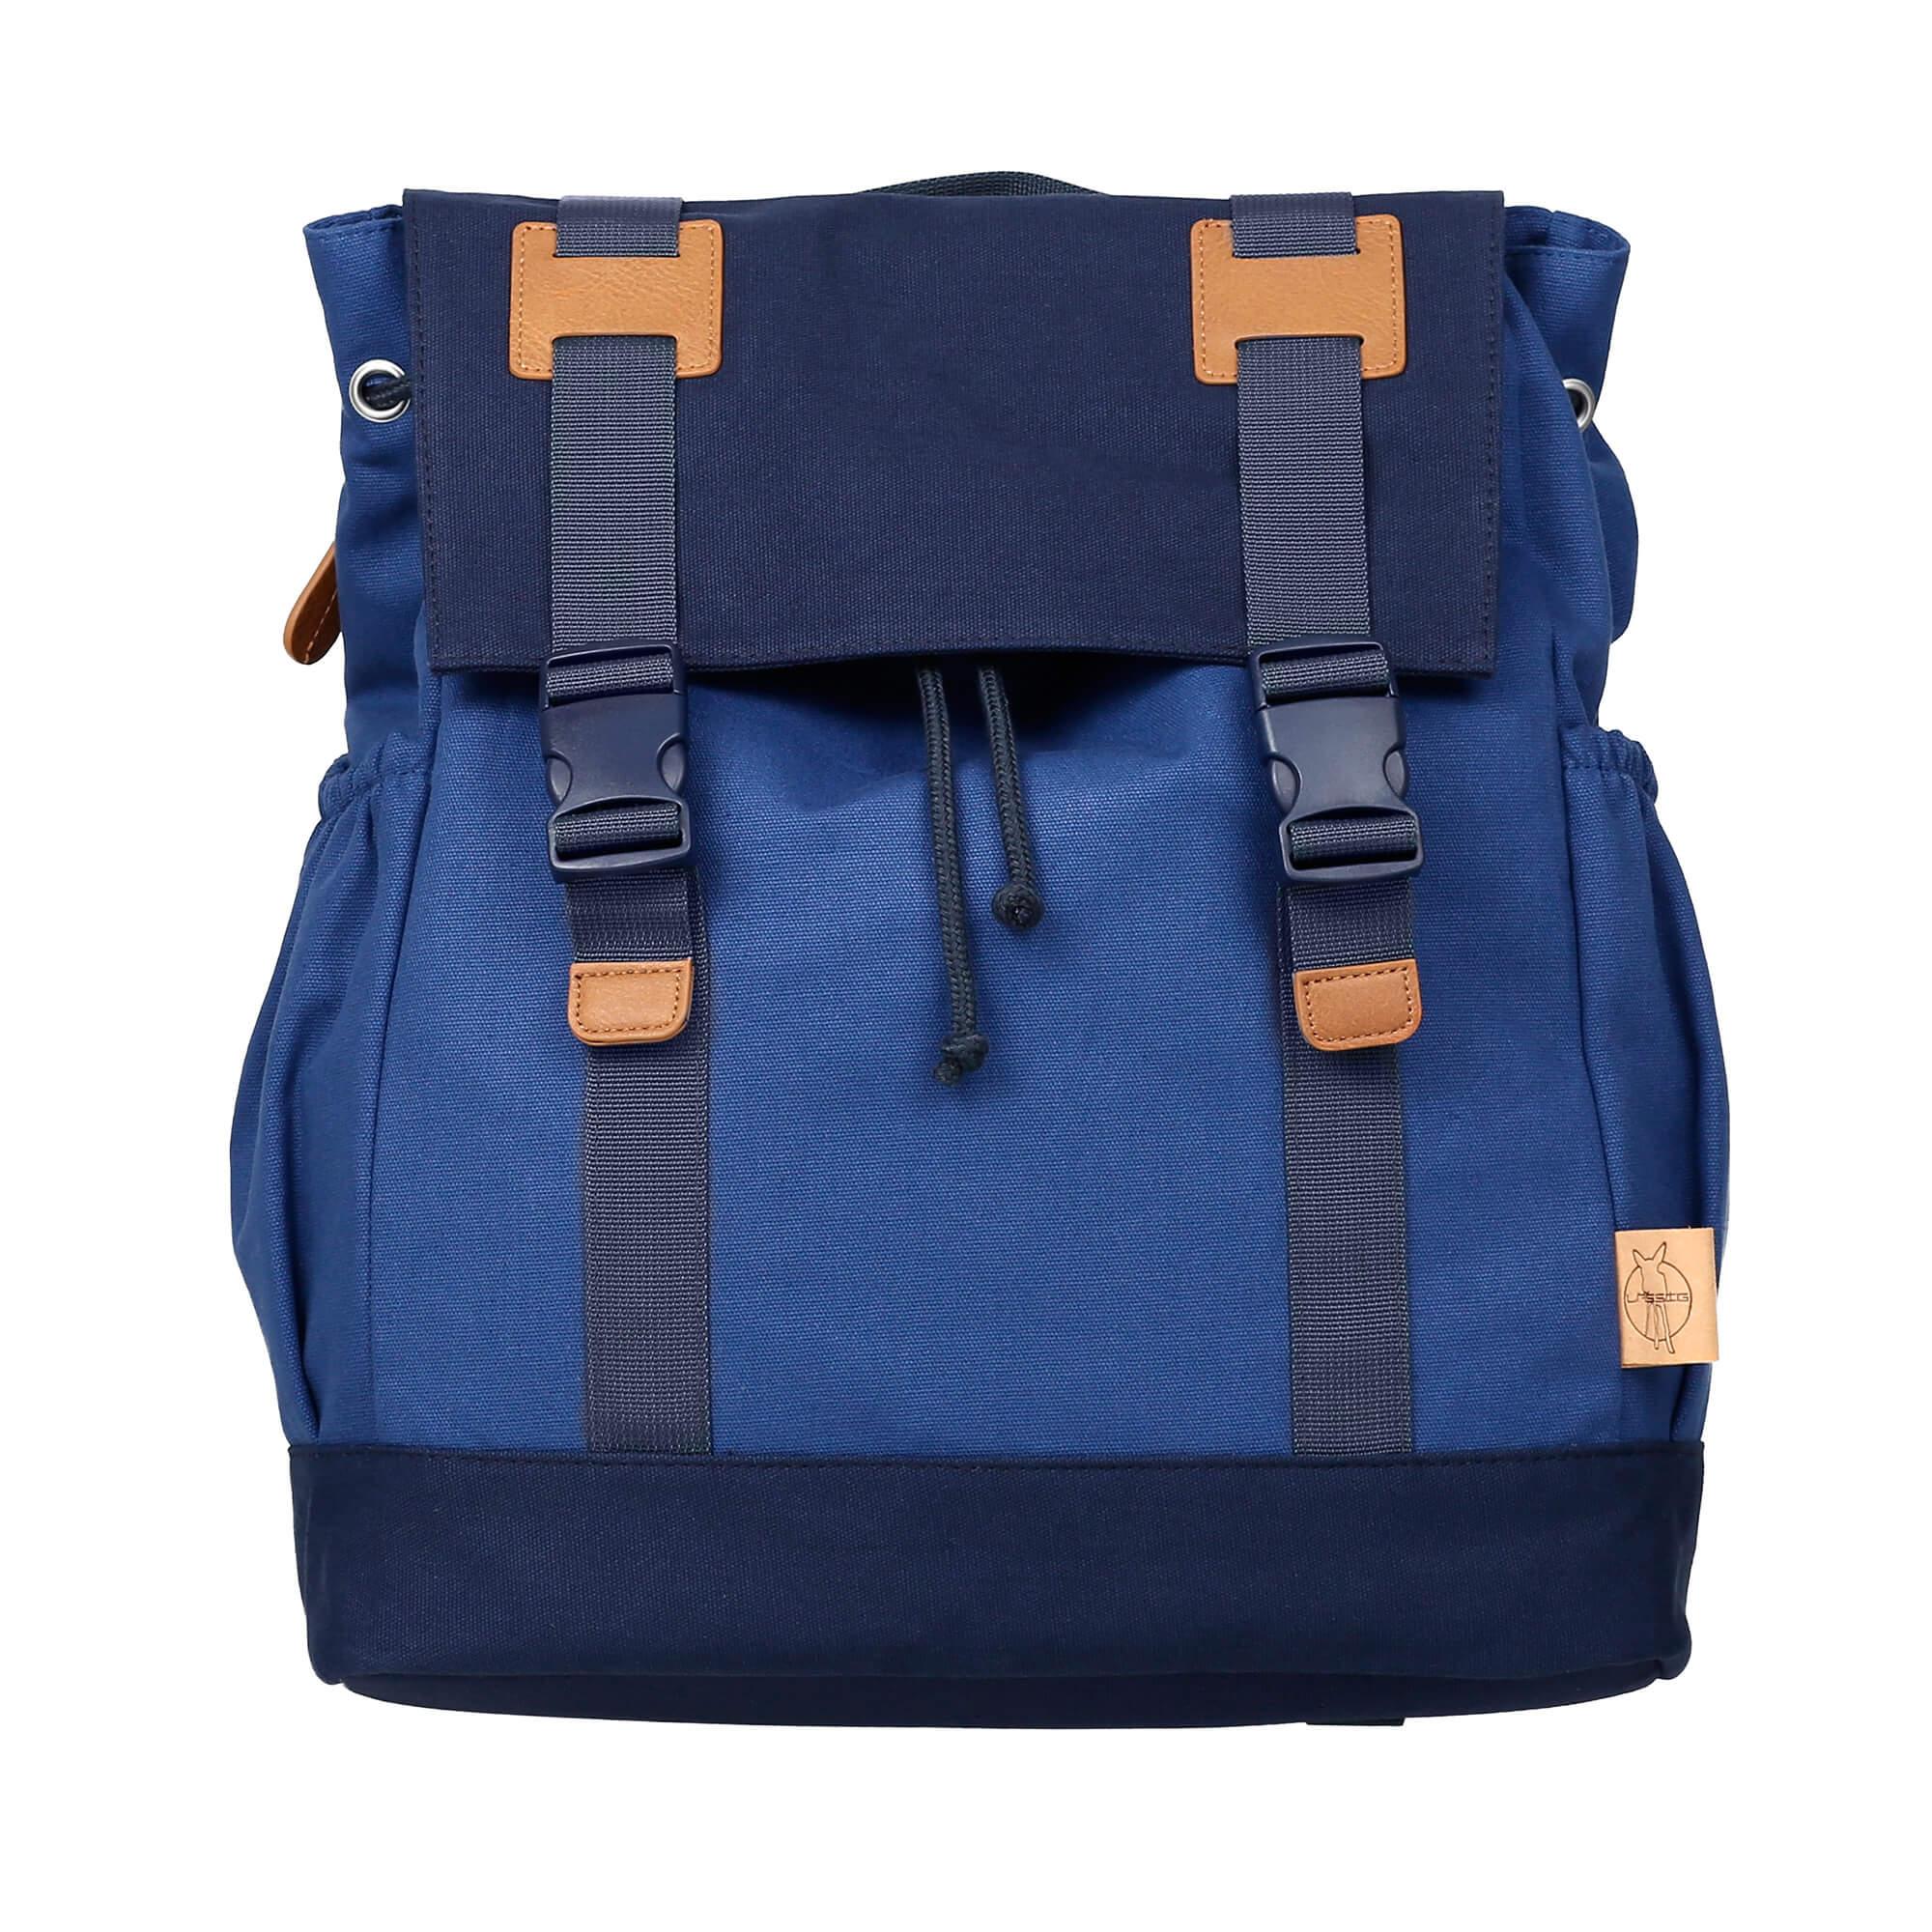 Wickelrucksack little one me backpack big blue lÄssig